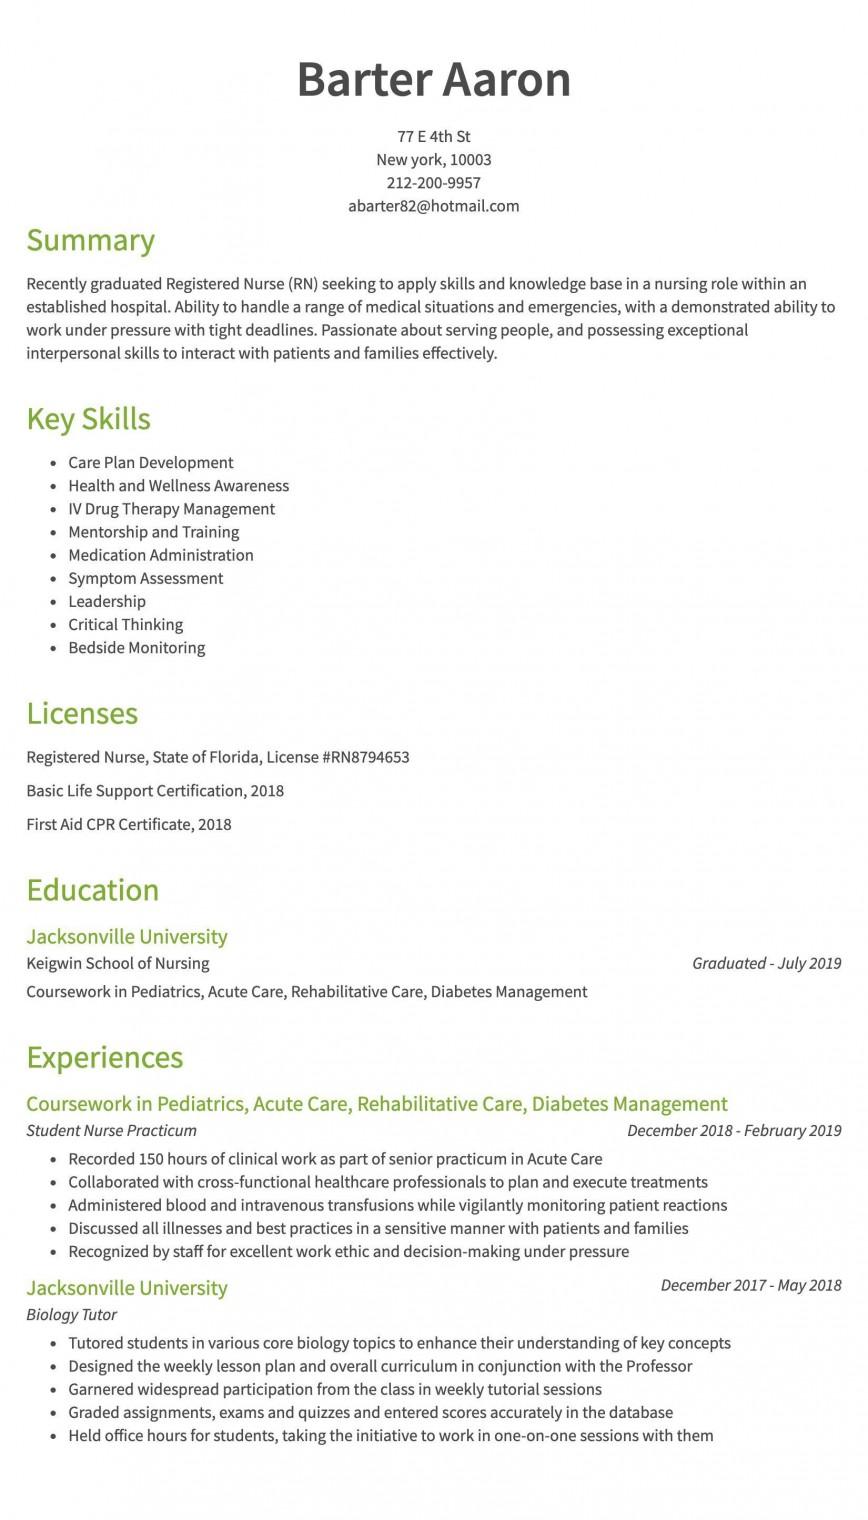 008 Remarkable Rn Graduate Resume Template High Resolution  New Grad Nurse868